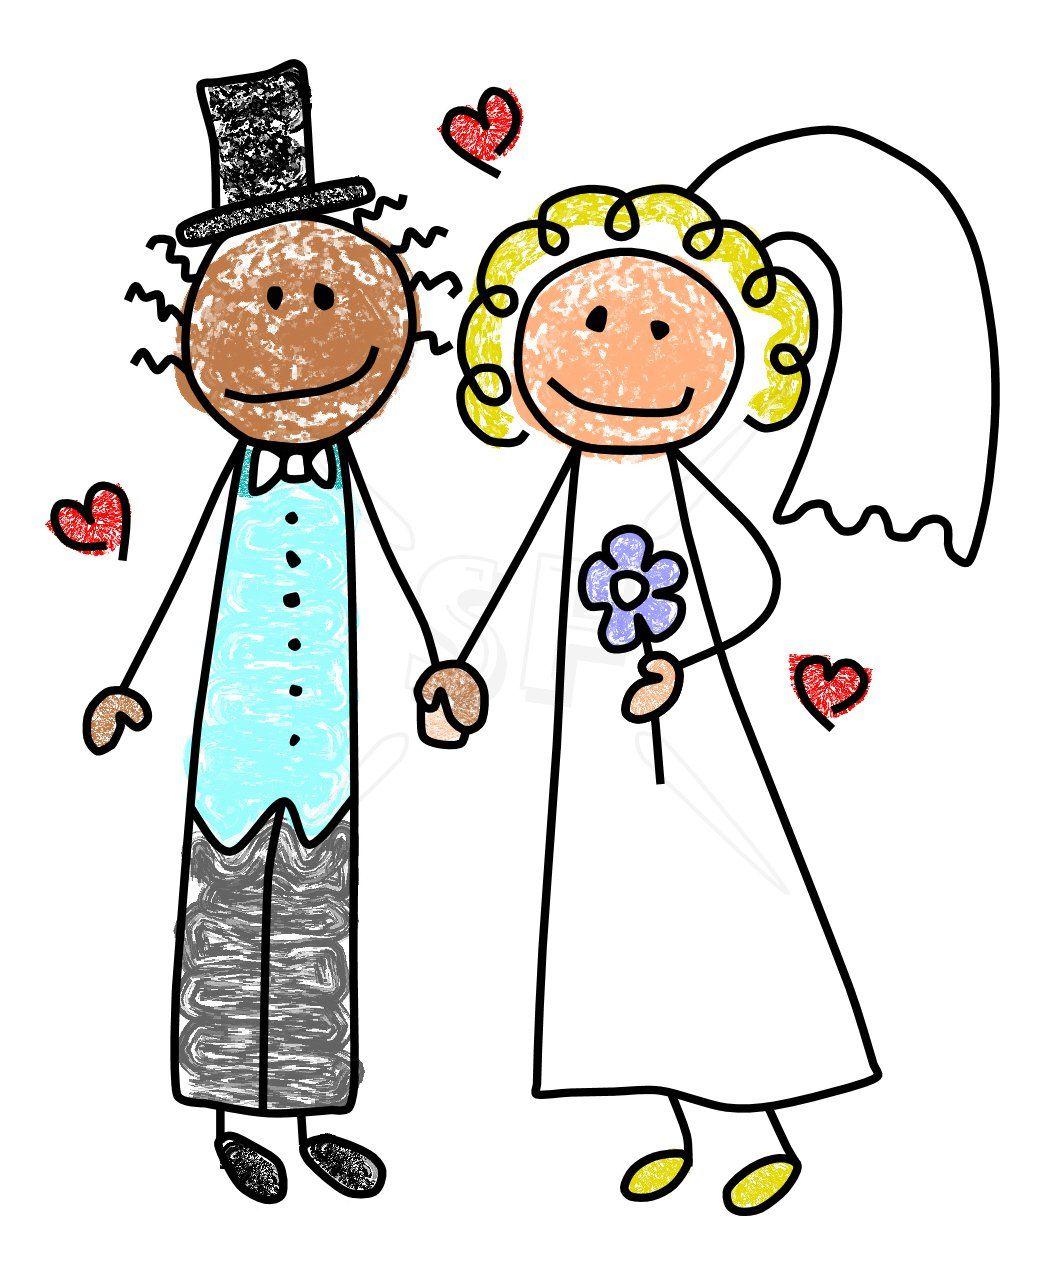 Bridal clipart cute. Groom bride stick figures